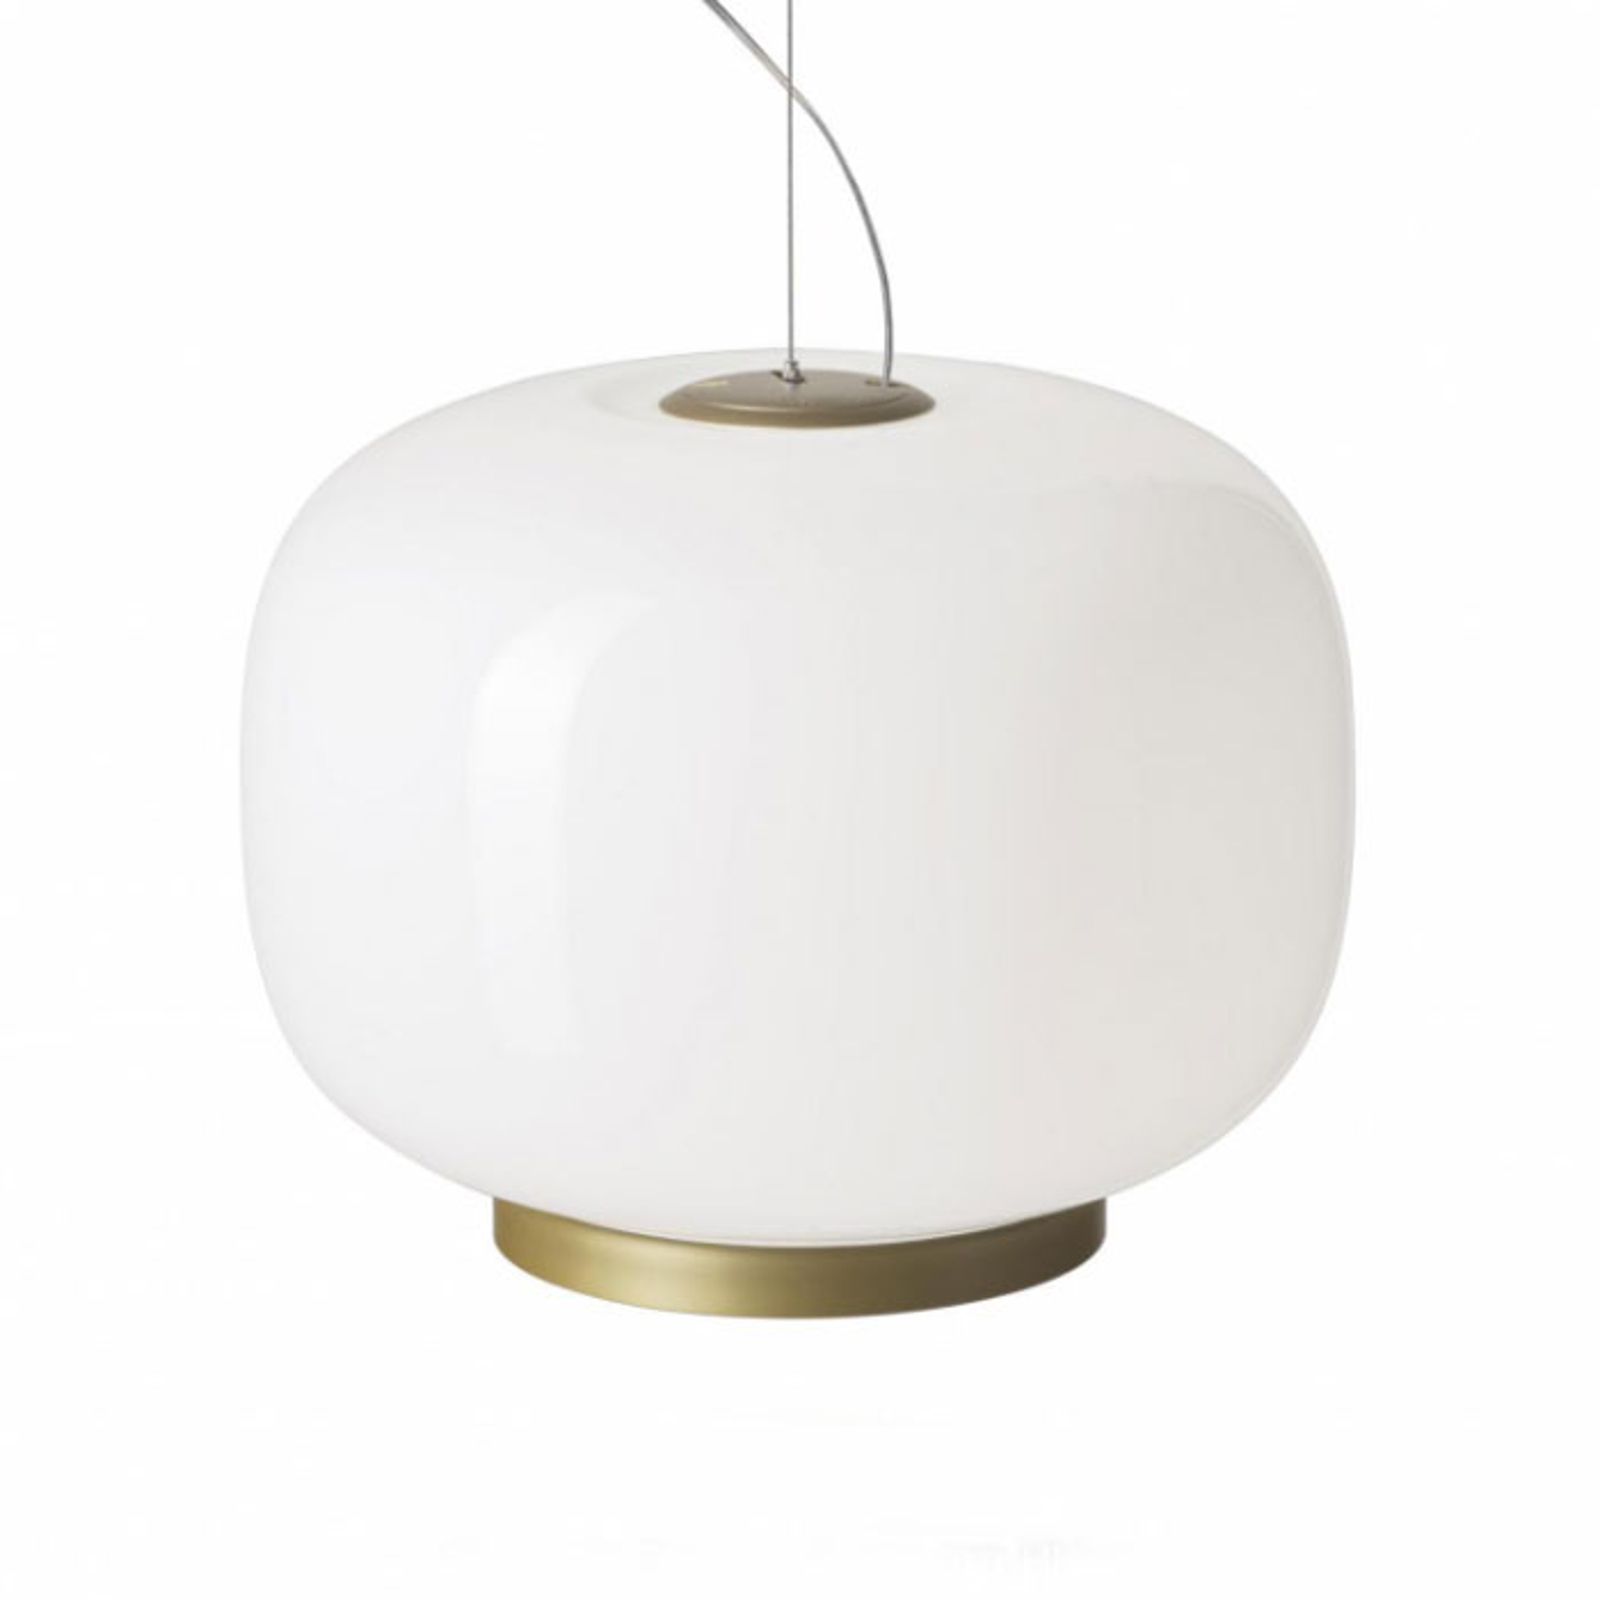 Foscarini Chouchin Reverse 1 E27 LED gold/gold